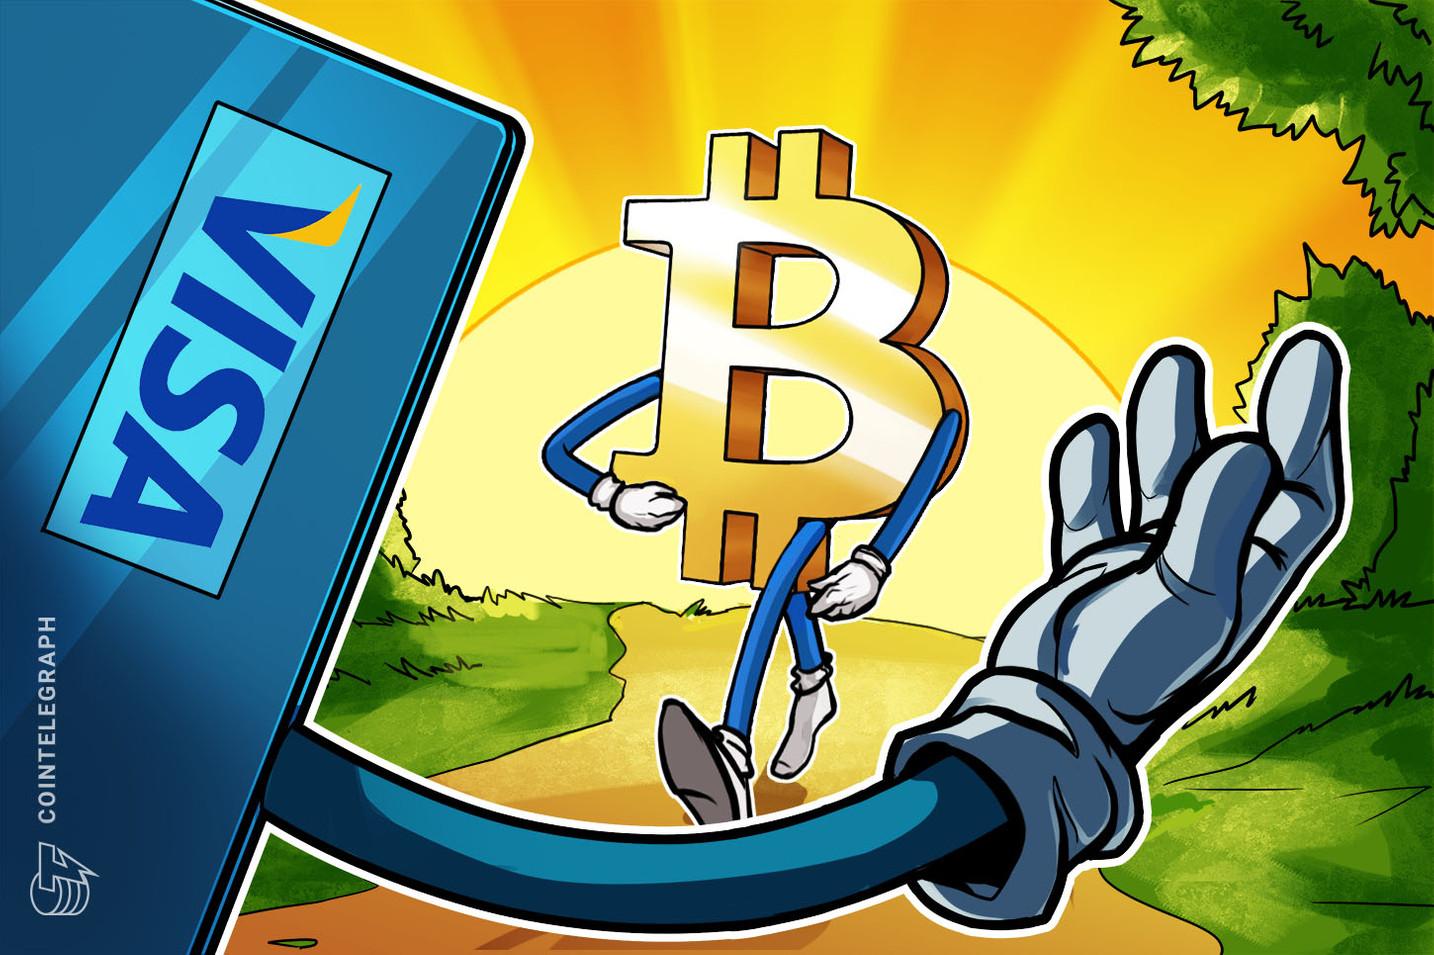 Visa aprobará la tarjeta de Bitcoin para la empresa australiana CryptoSpend